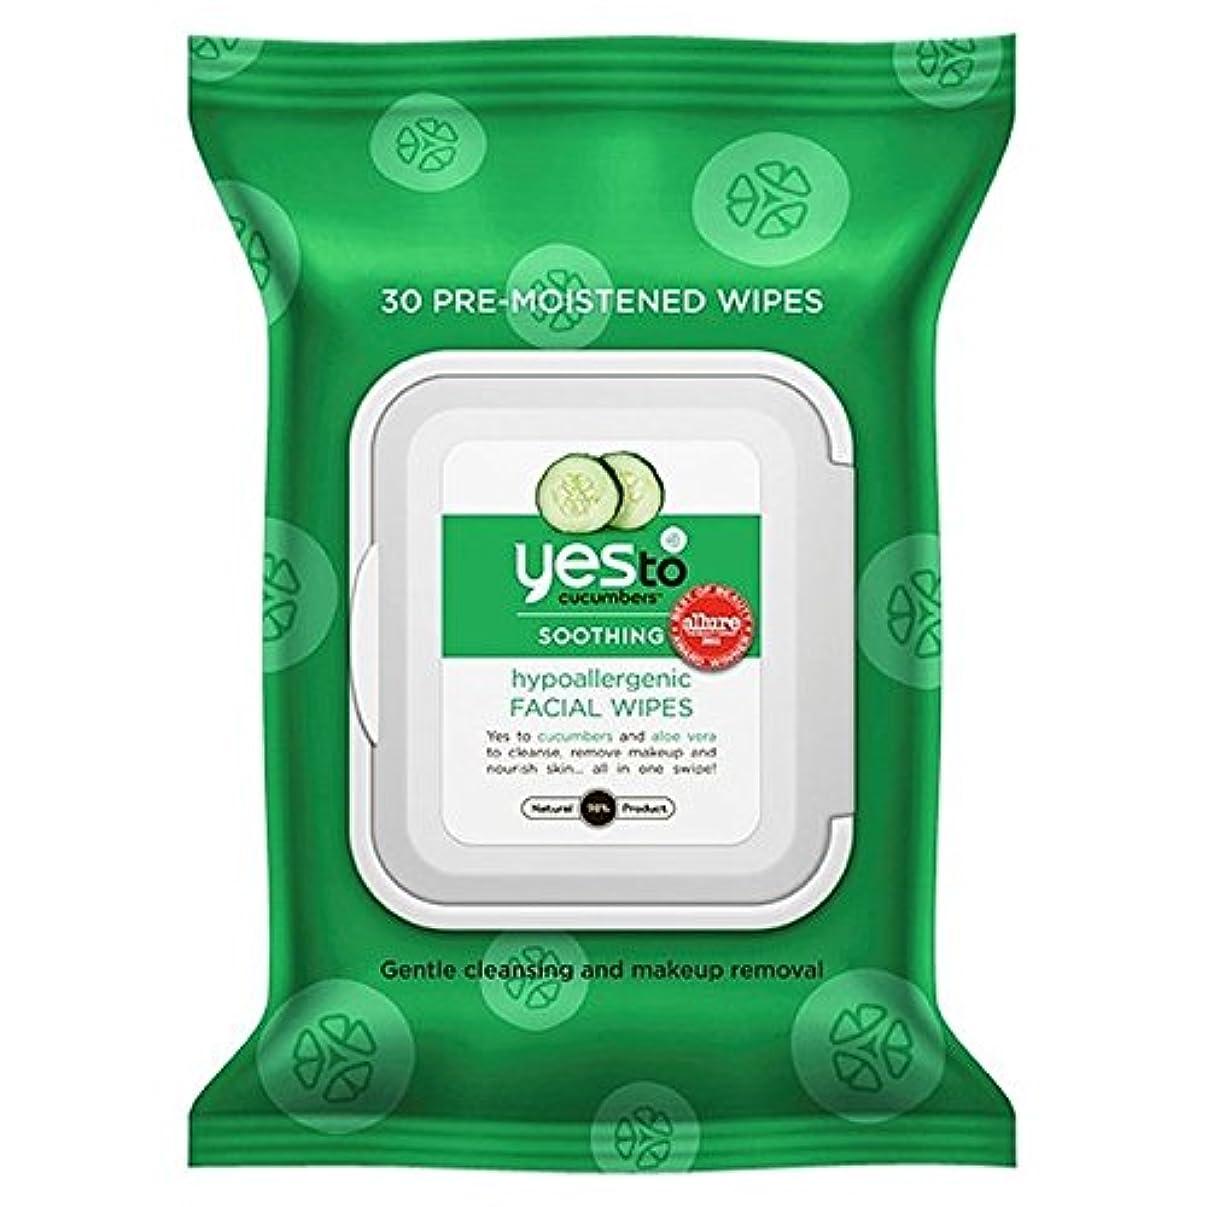 Yes to Cucumbers Wipes 25 per pack - はいキュウリにパックあたり25ワイプ [並行輸入品]